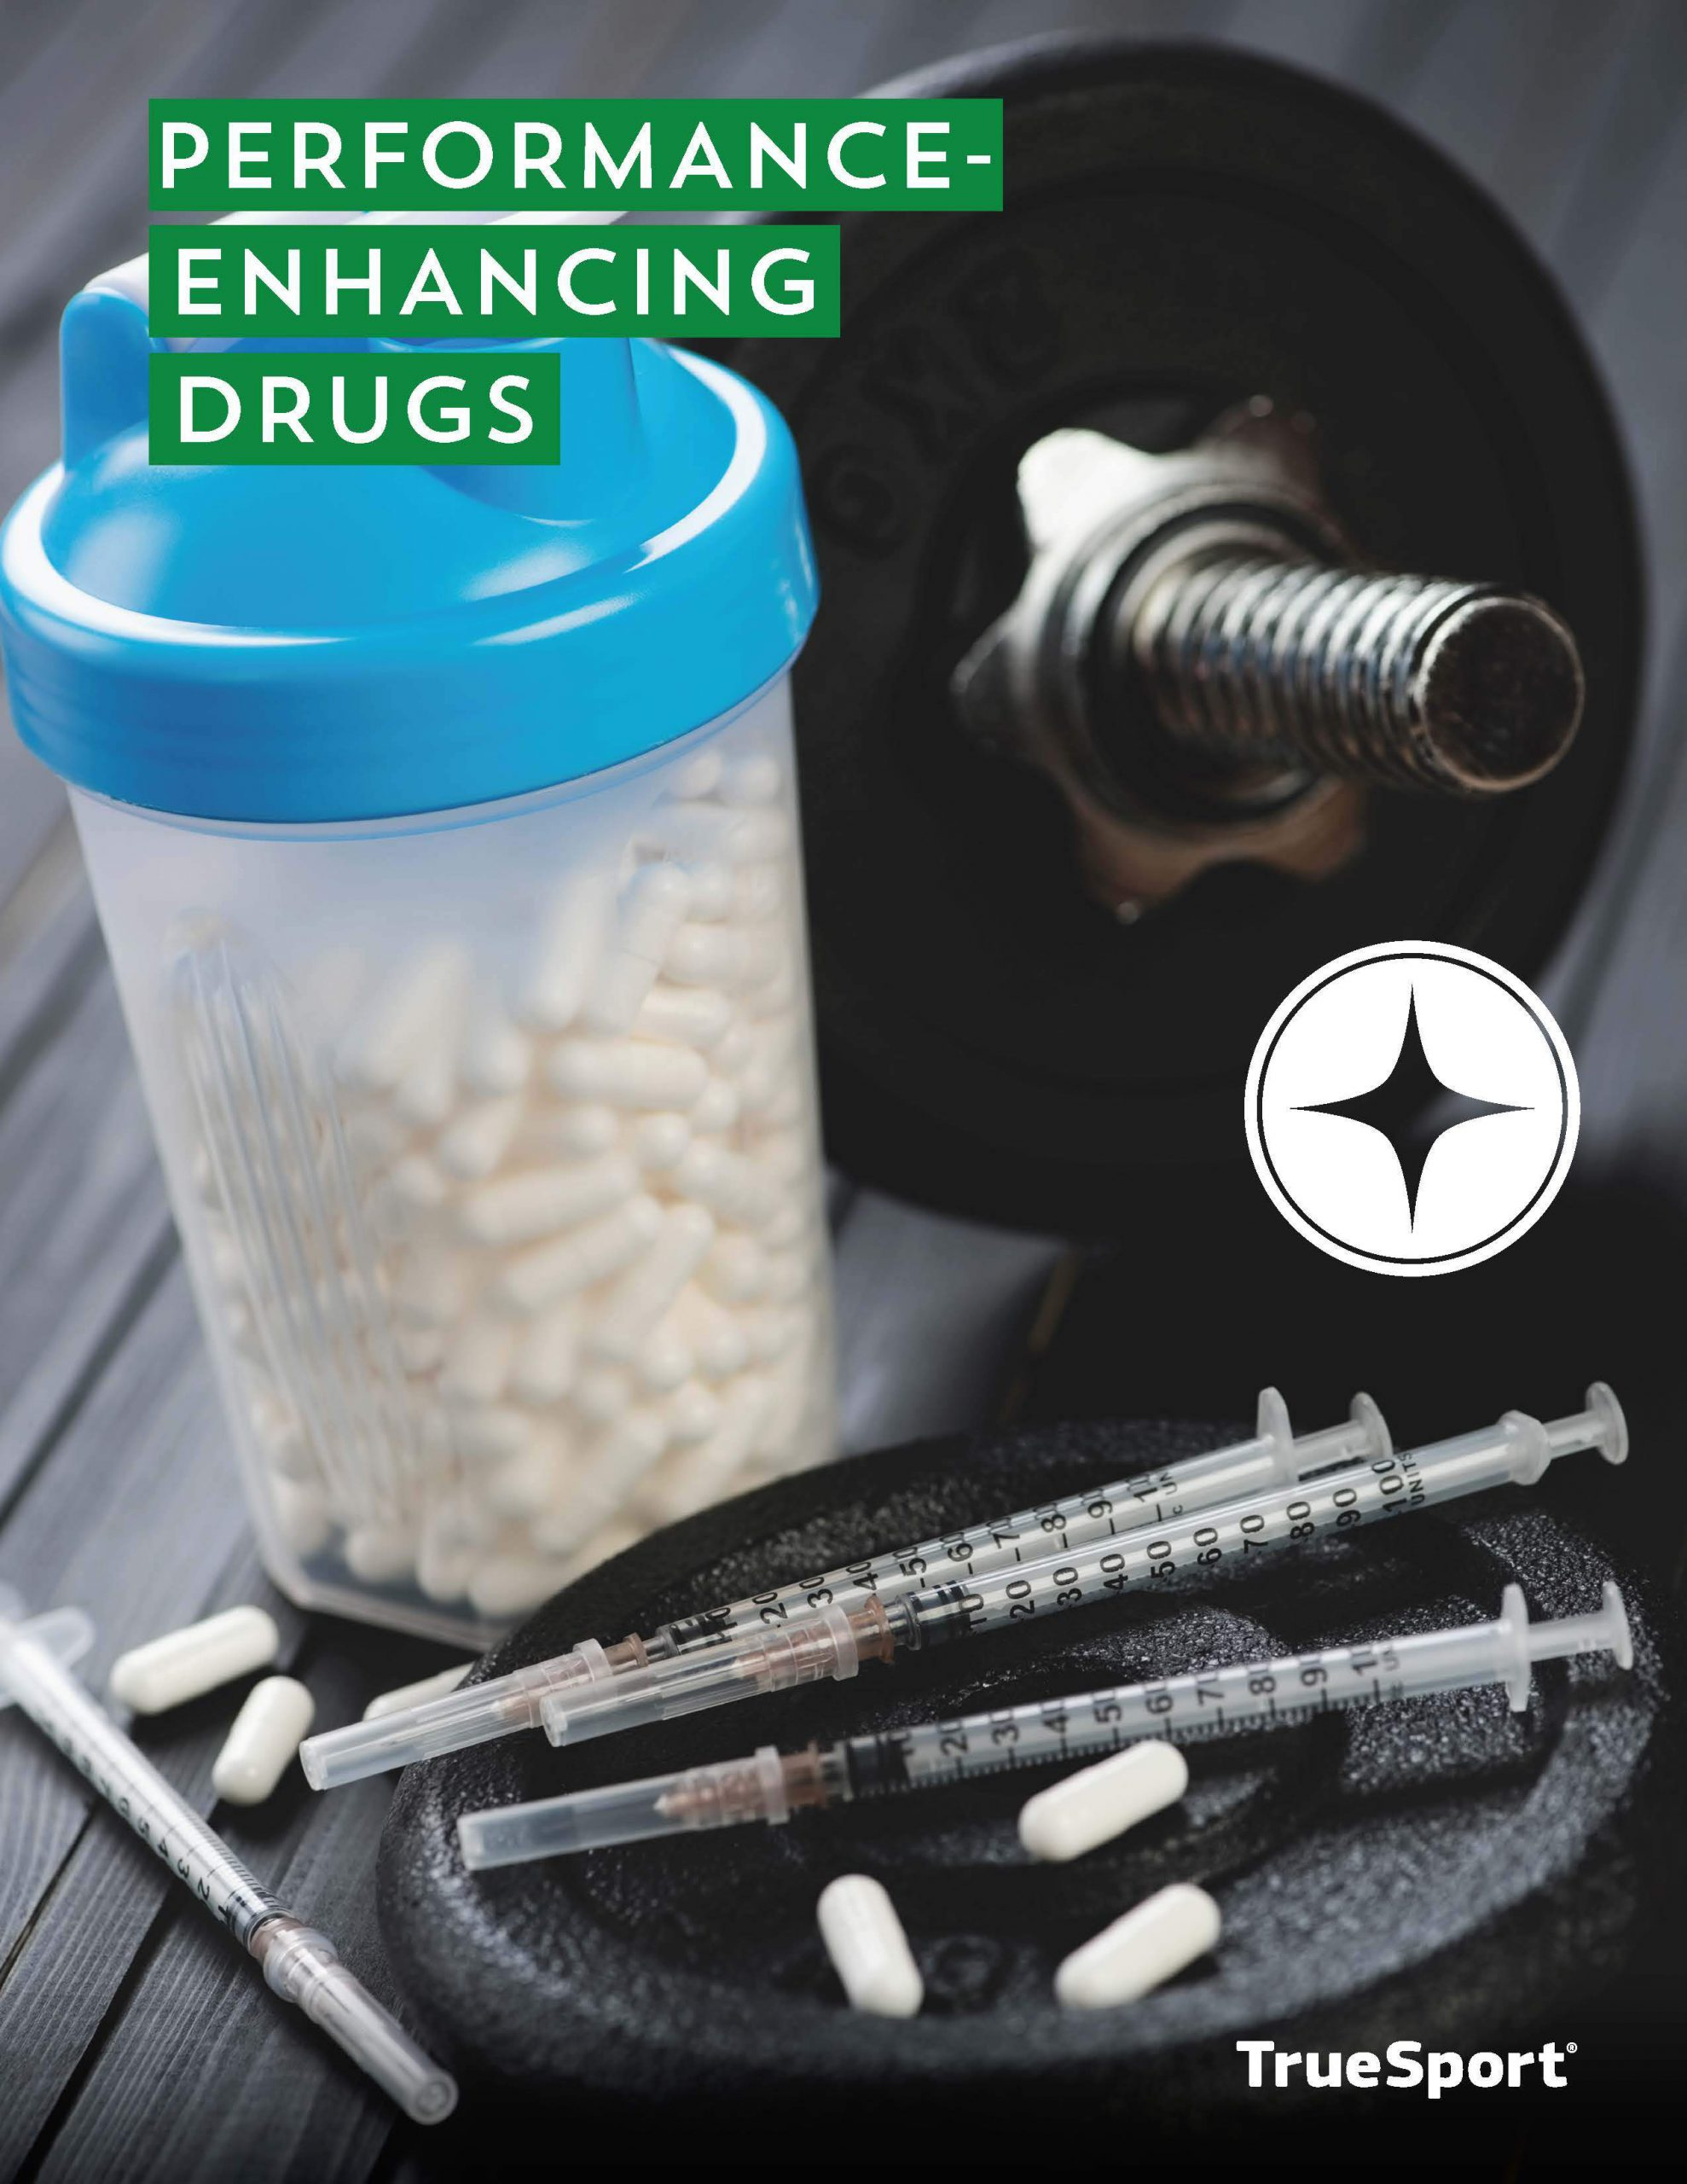 TrueSport performance-enhanacing drugs lesson cover image.